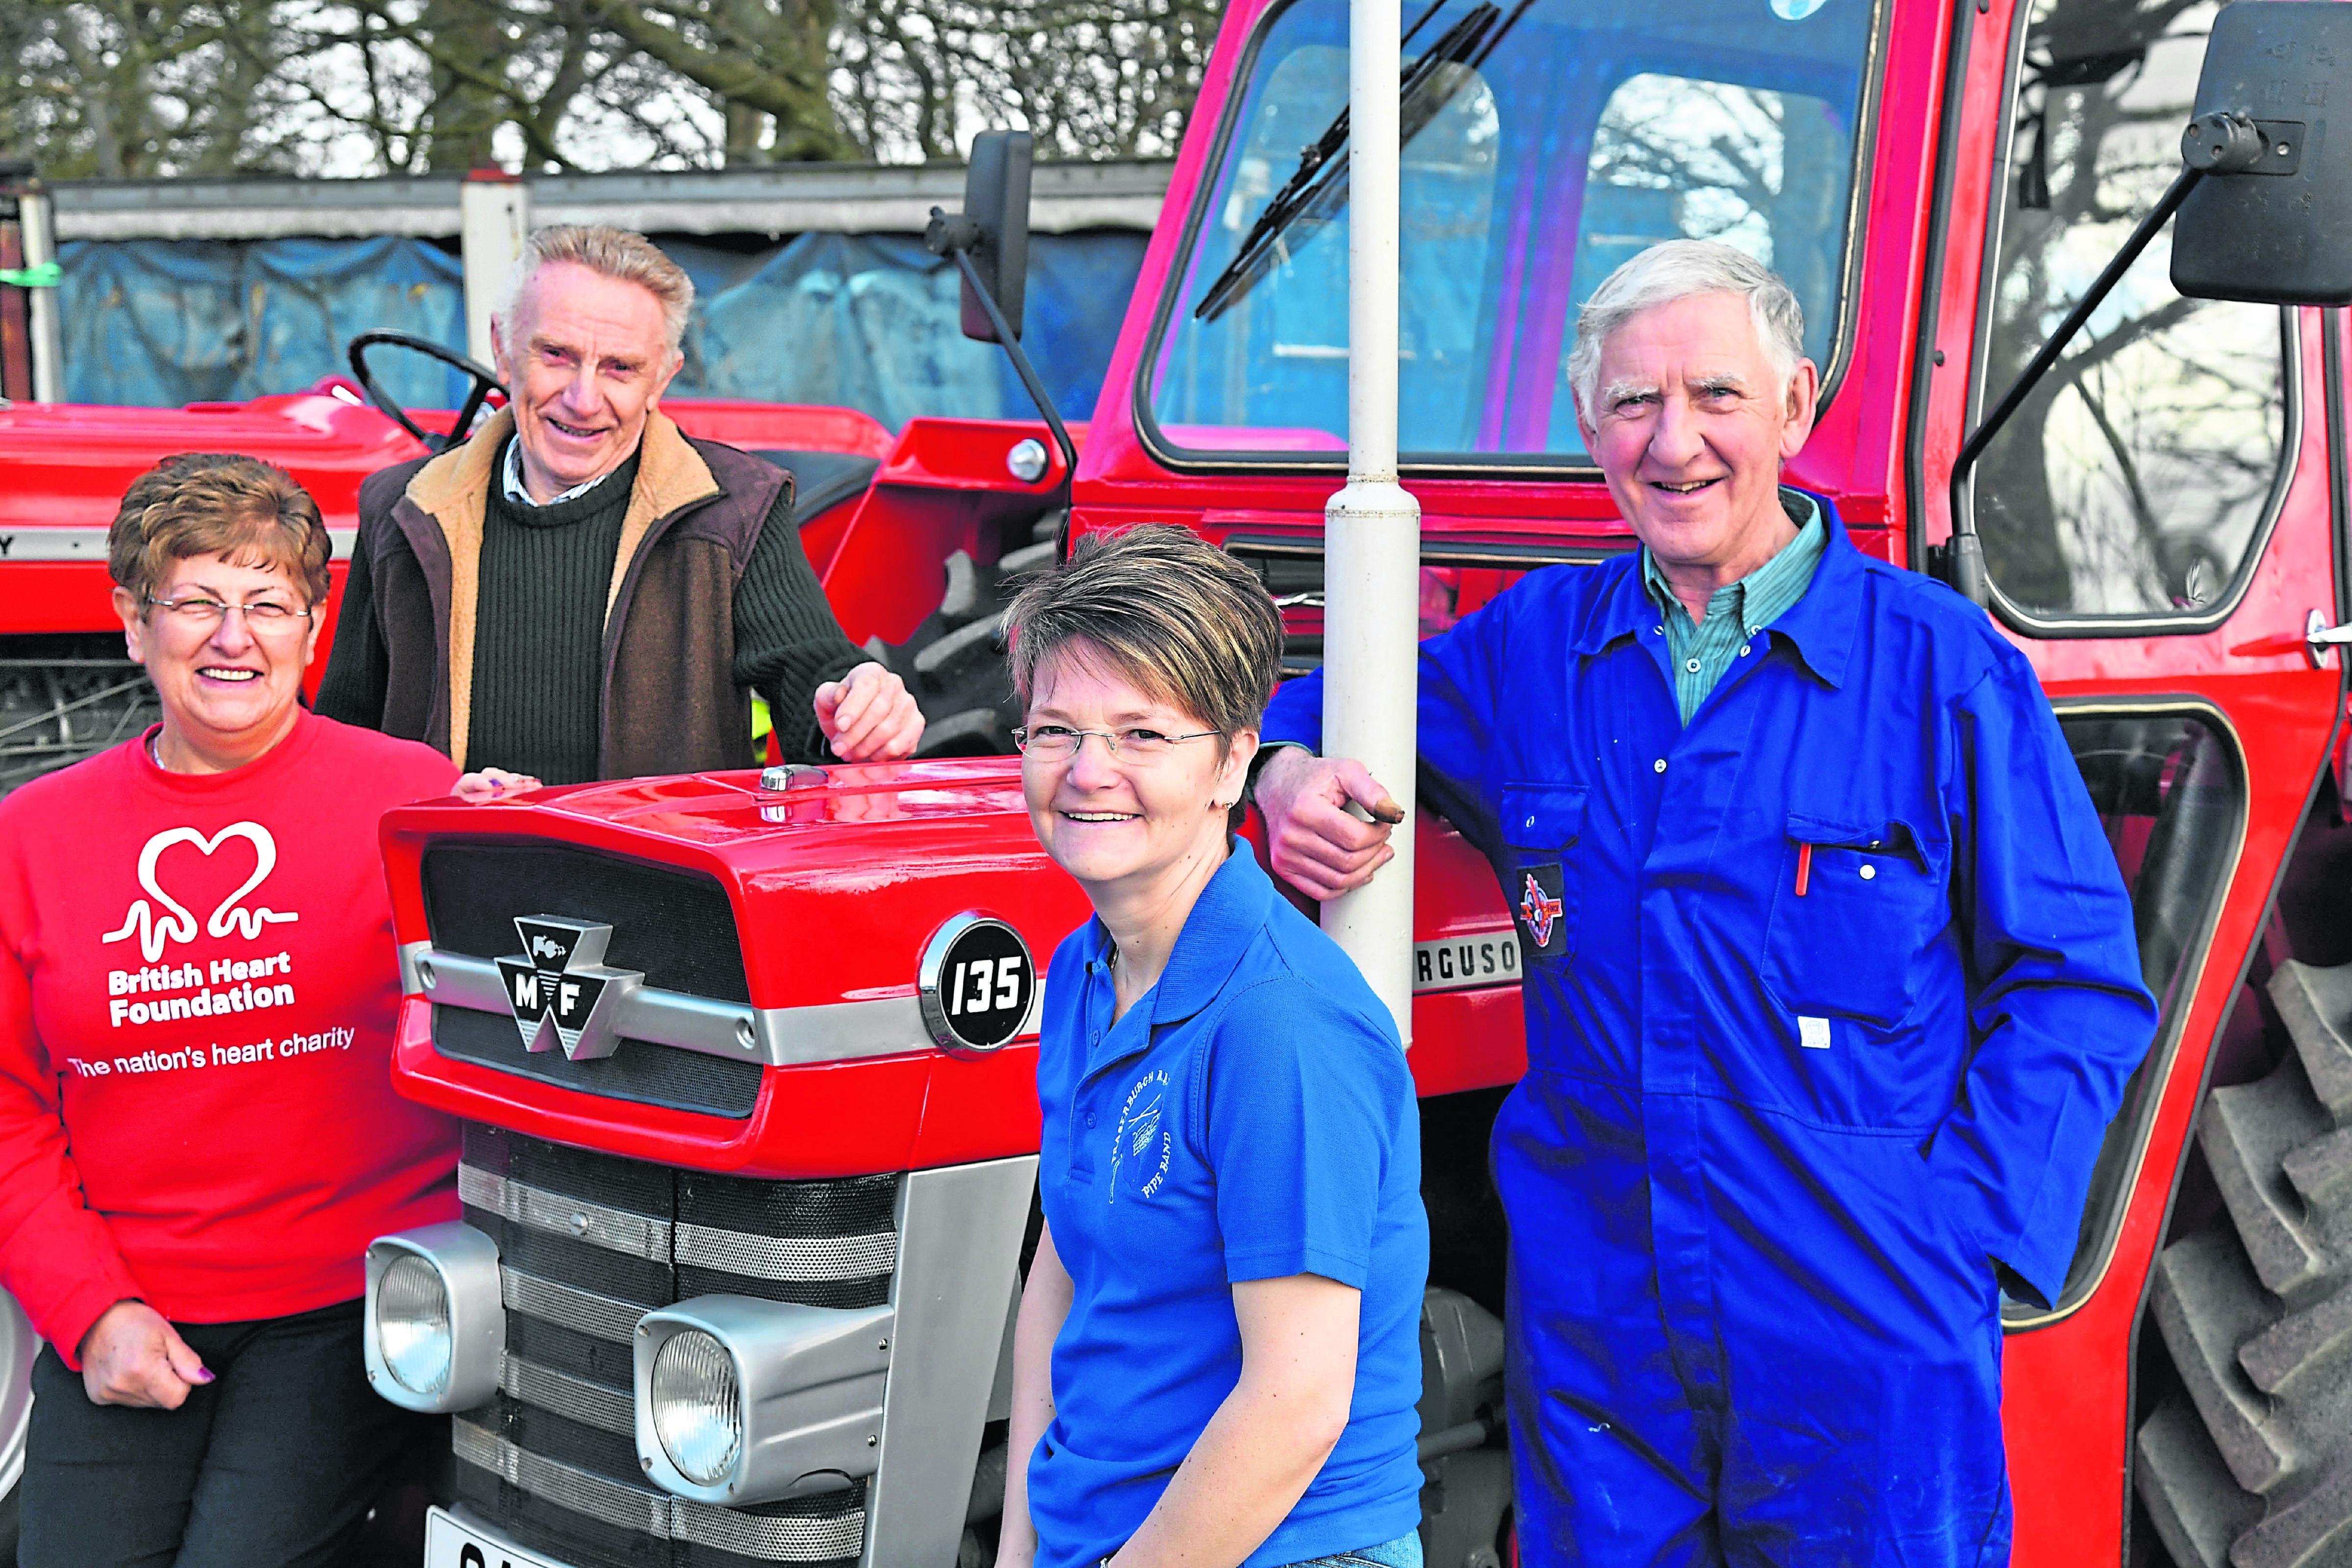 Liz Inglis, John Mutch, Denise Buchan, Bill Ironside.